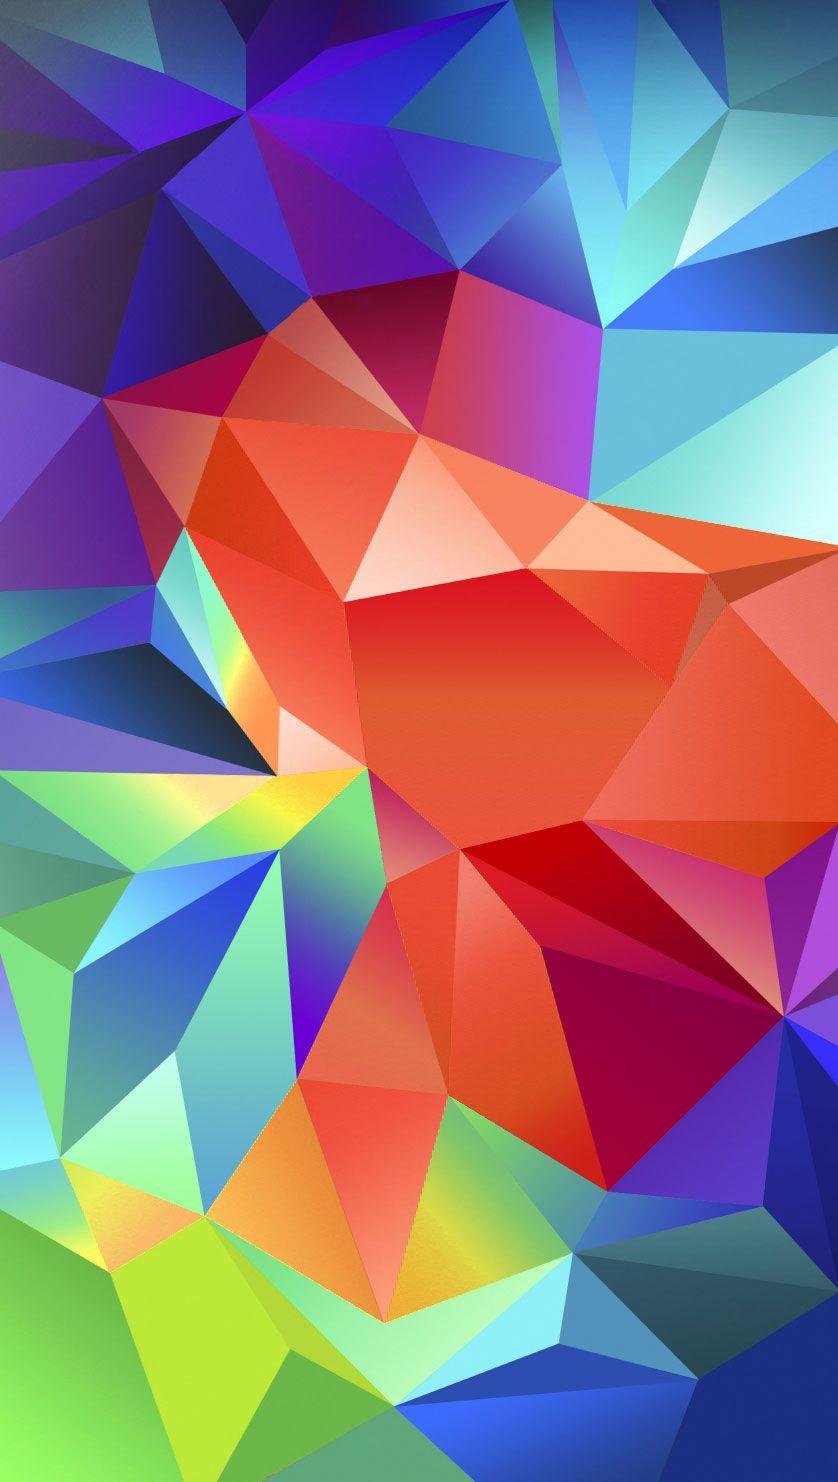 Samsung Galaxy S5 Wallpapers S5 Wallpaper Samsung Galaxy Wallpaper Galaxy Wallpaper